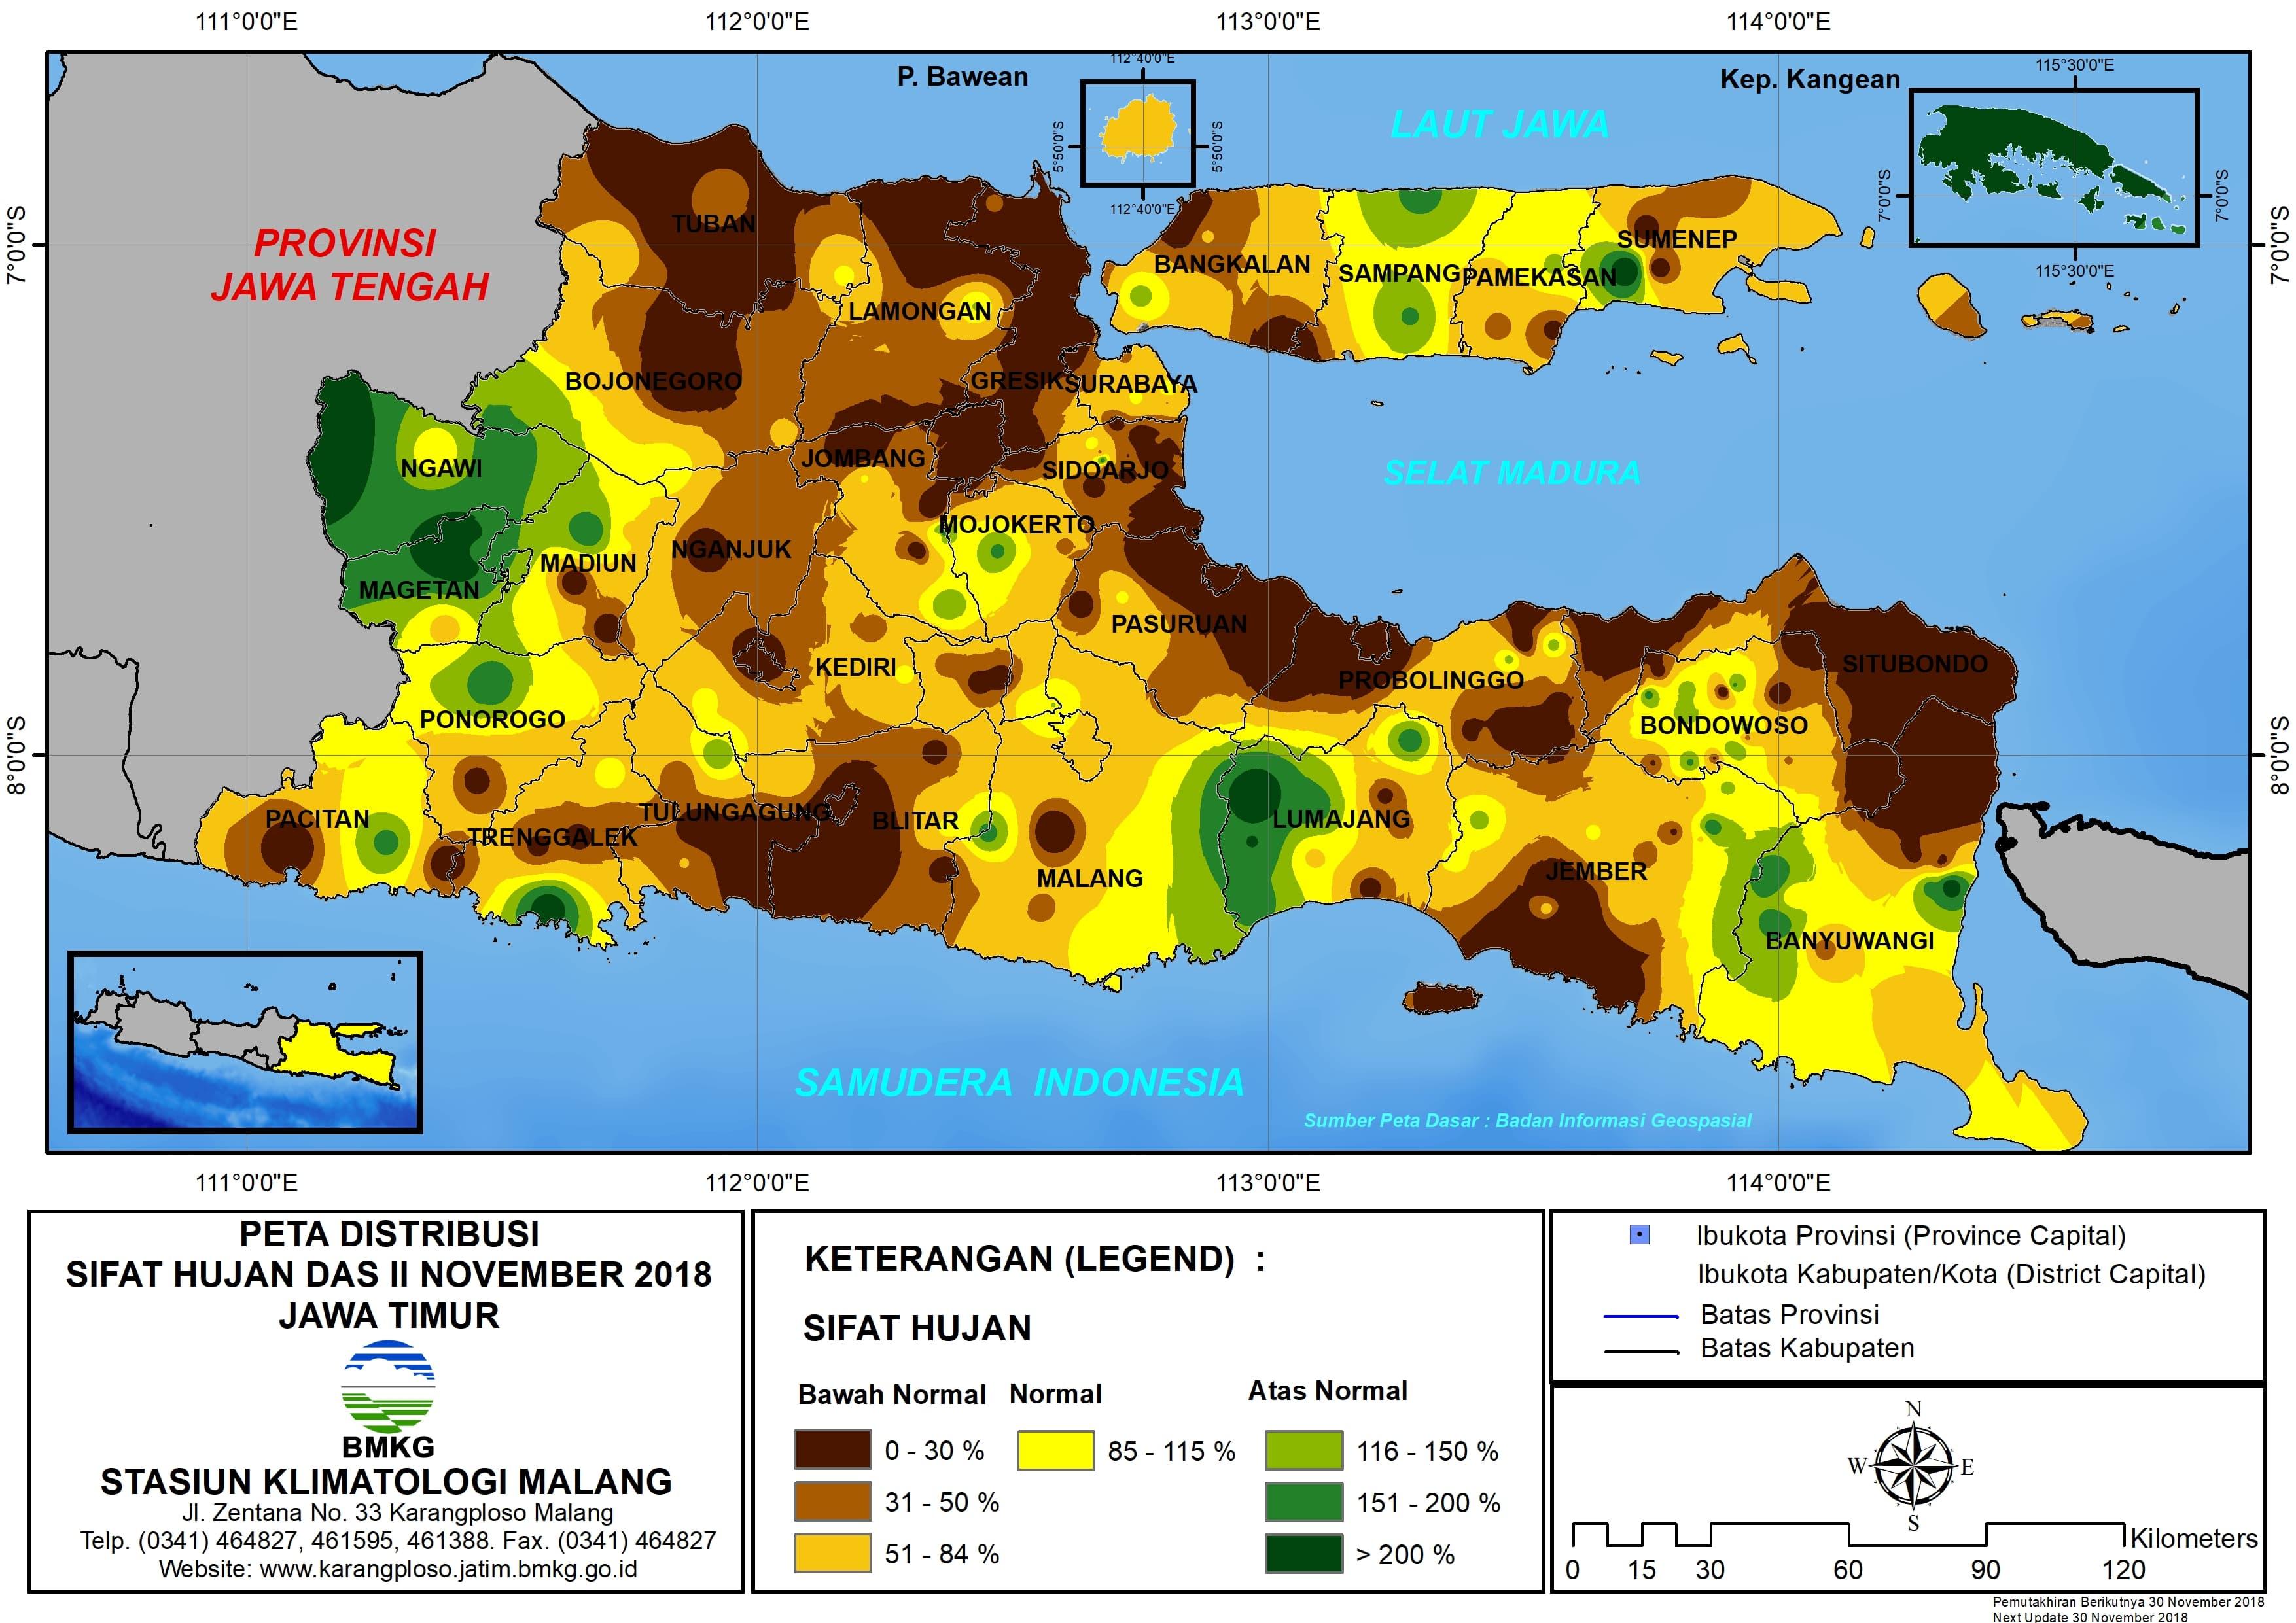 Peta Analisis Distribusi Sifat Hujan Dasarian II November 2018 di Provinsi Jawa Timur